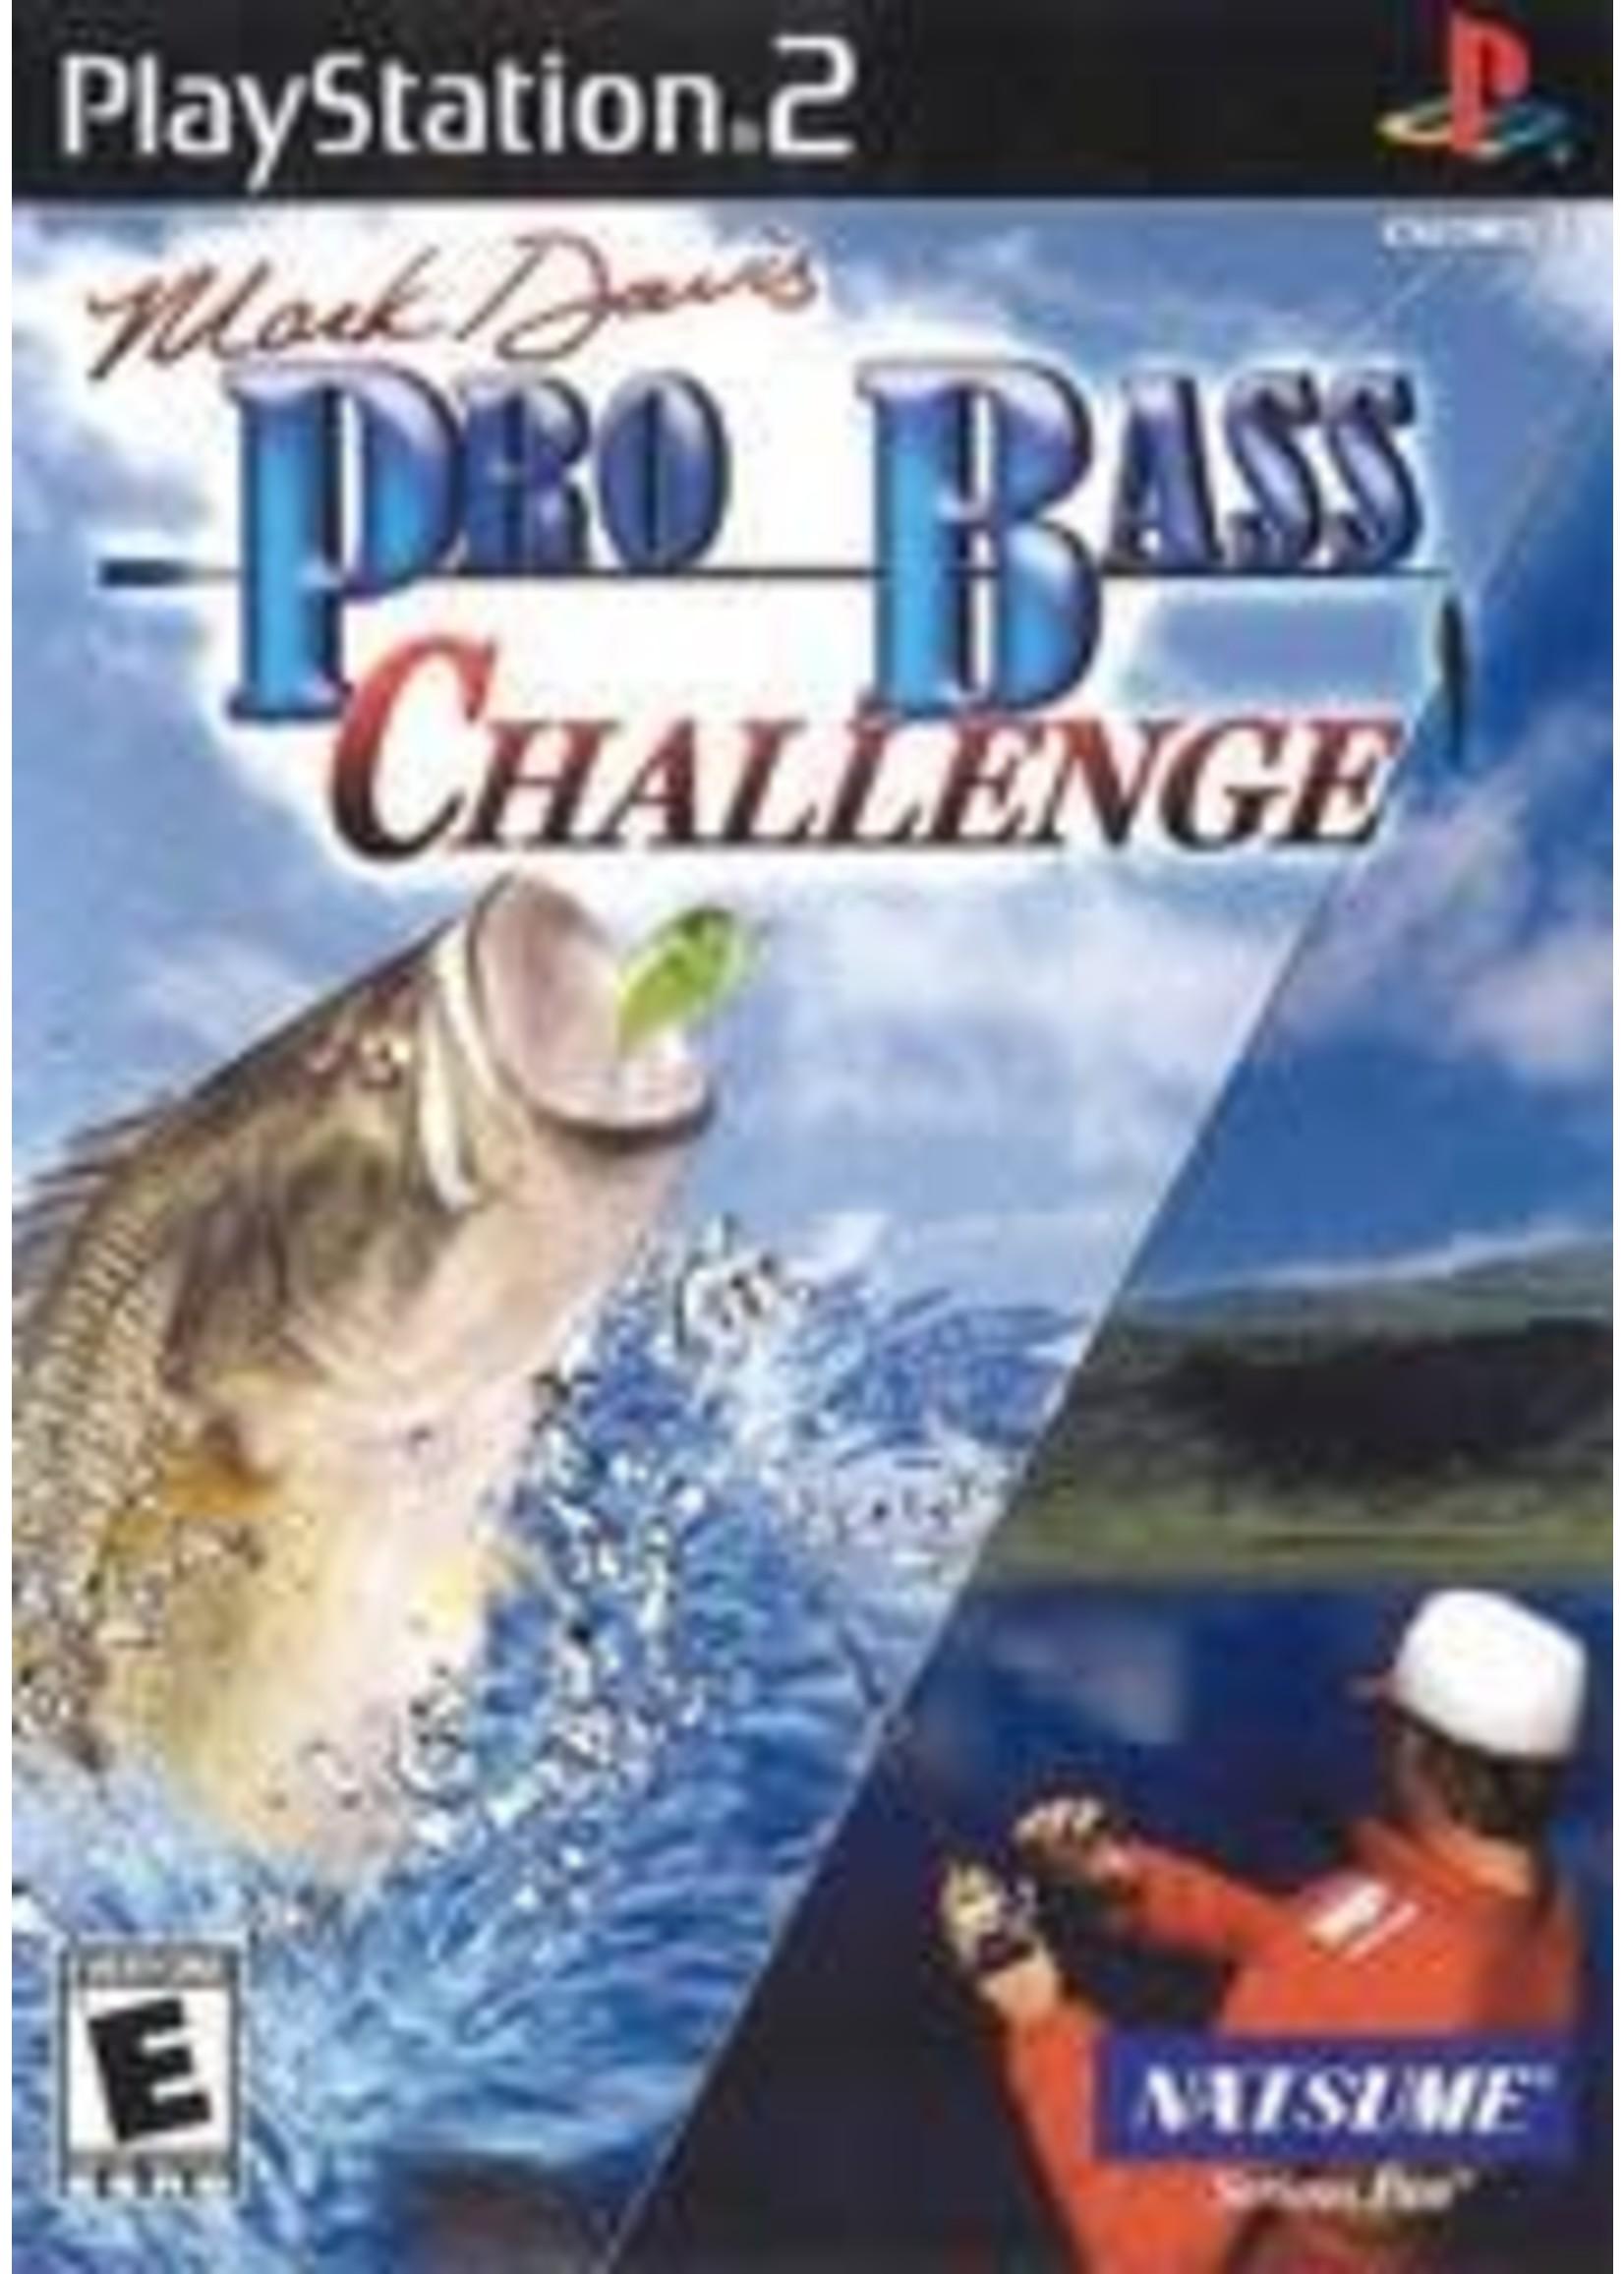 Mark Davis Pro Bass Challenge Playstation 2